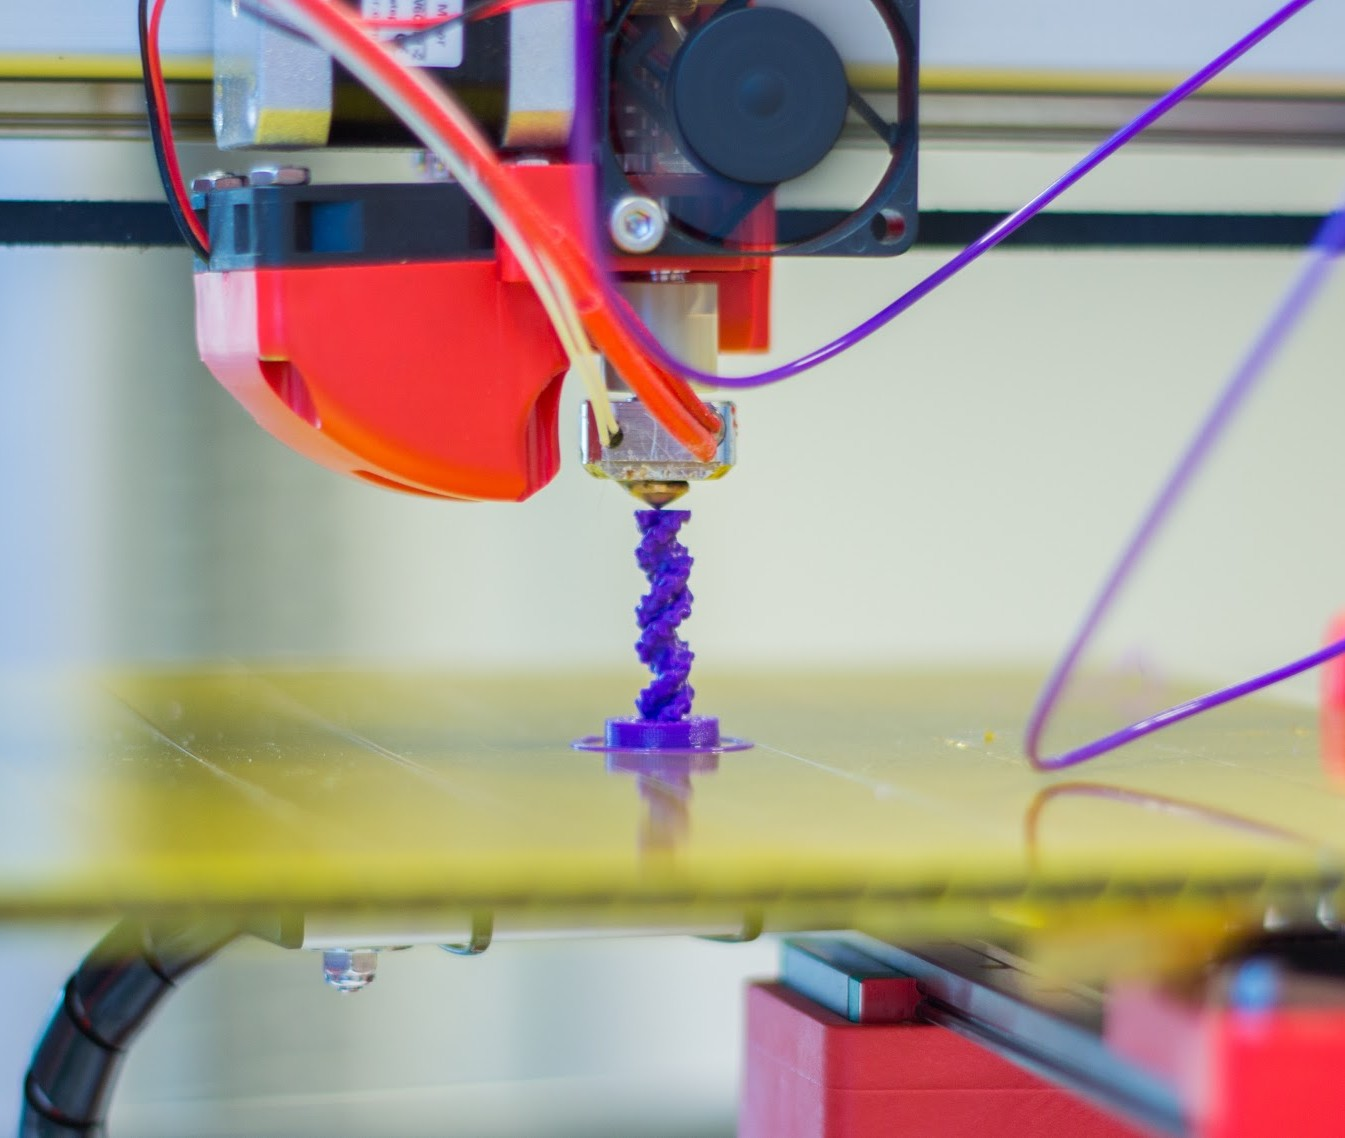 Photo of a 3D pinter printing something purple.